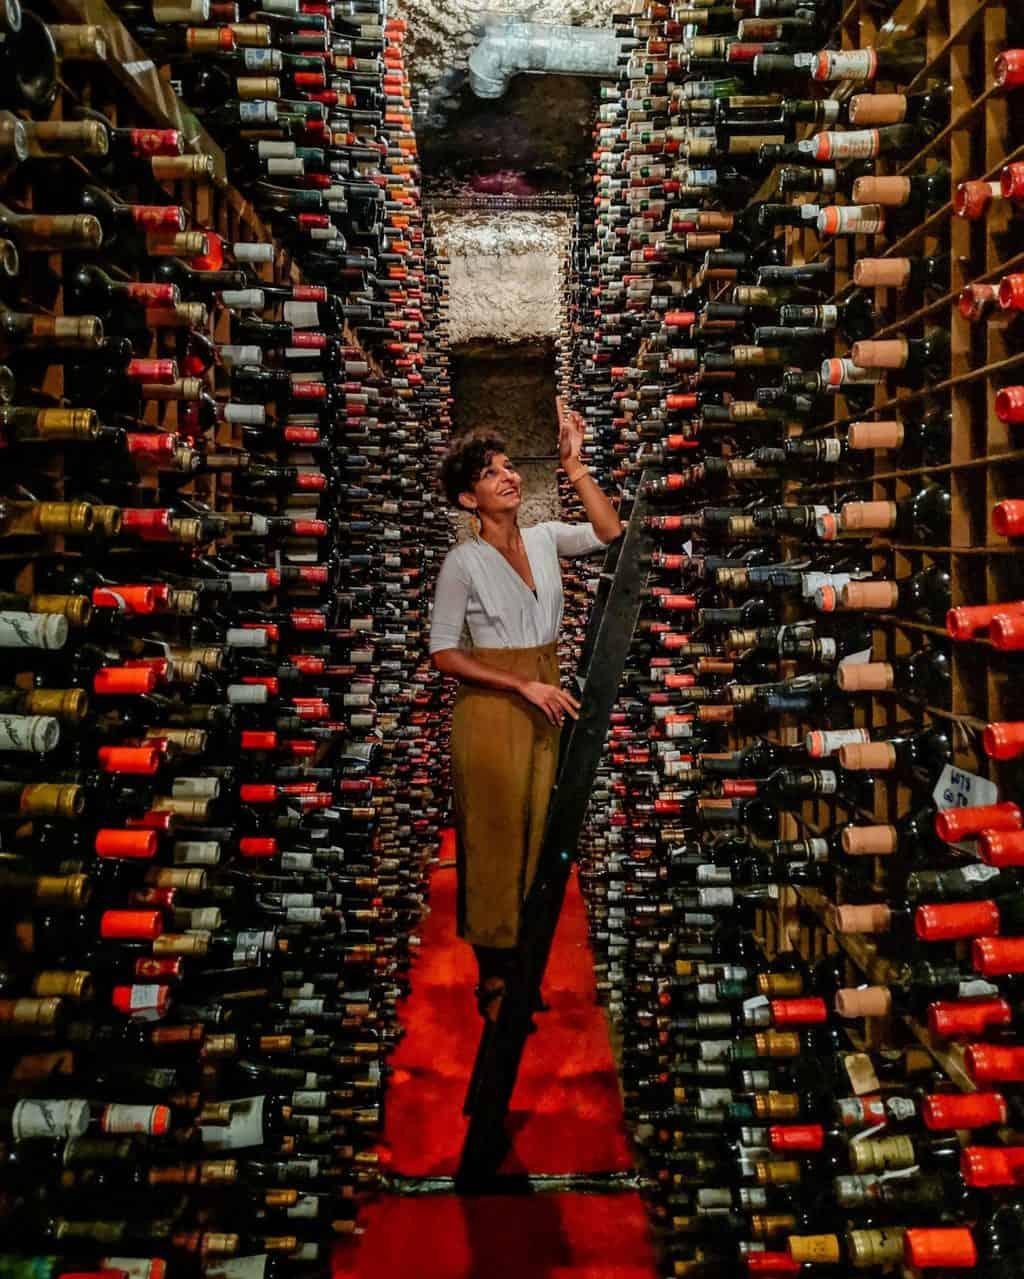 Bern's Steak House Wine Cellar SoHo Tampa restaurants